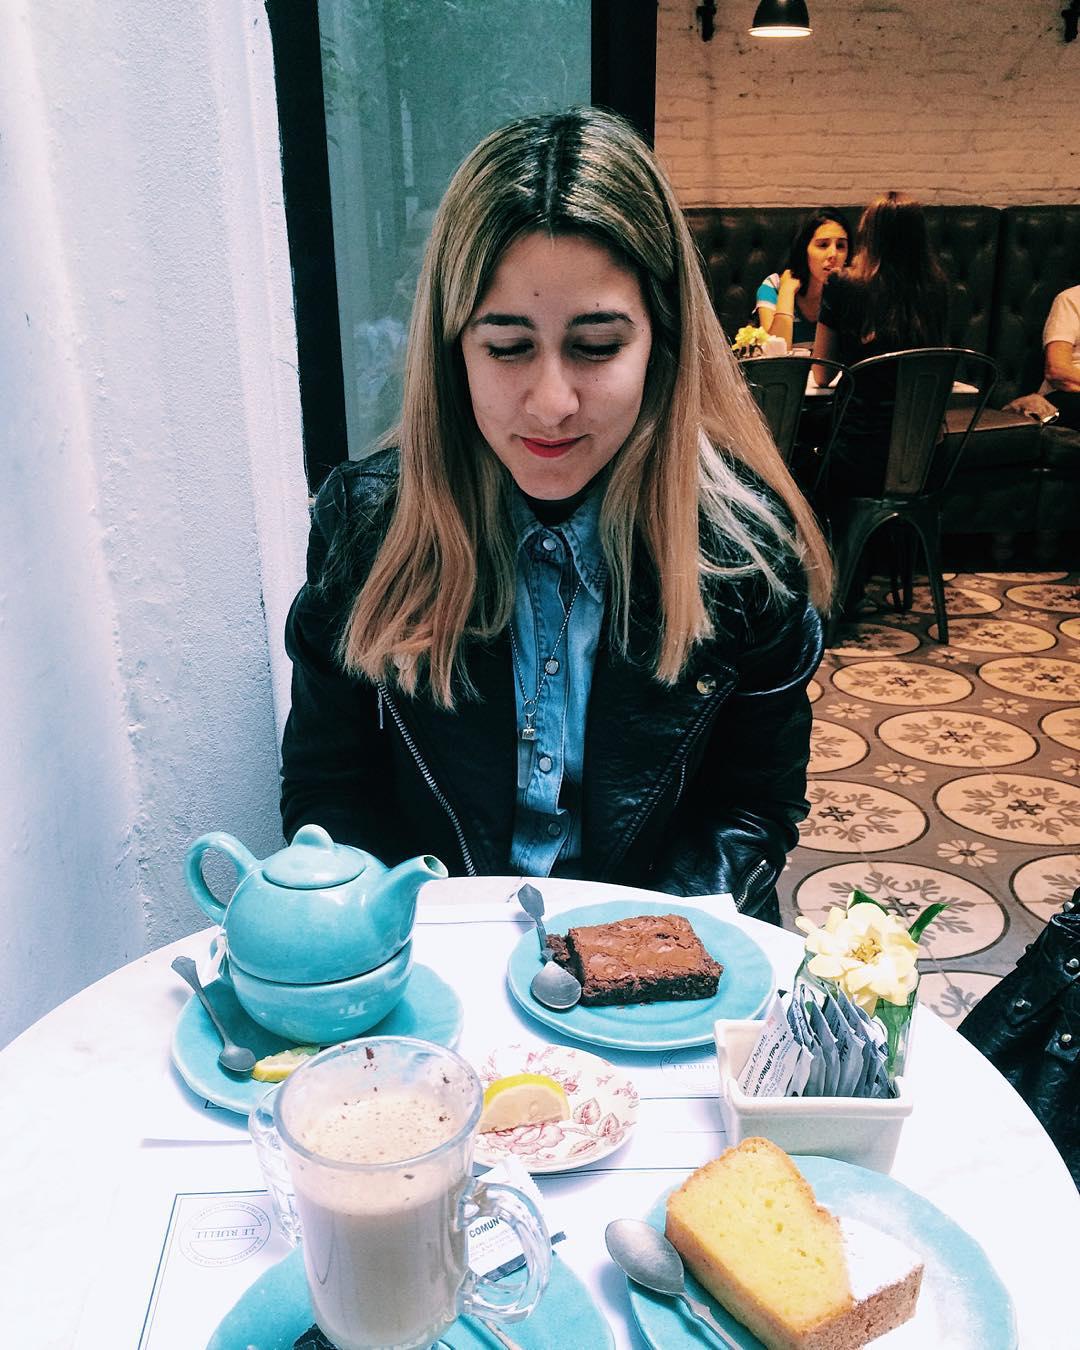 Disfrutando de las creaciones de @valuramallo - la ruelle ☕️ #laruelle #patisserie #apple #iphone #brownie #nutella #lemon #tea #coffee #teatime #5oclock